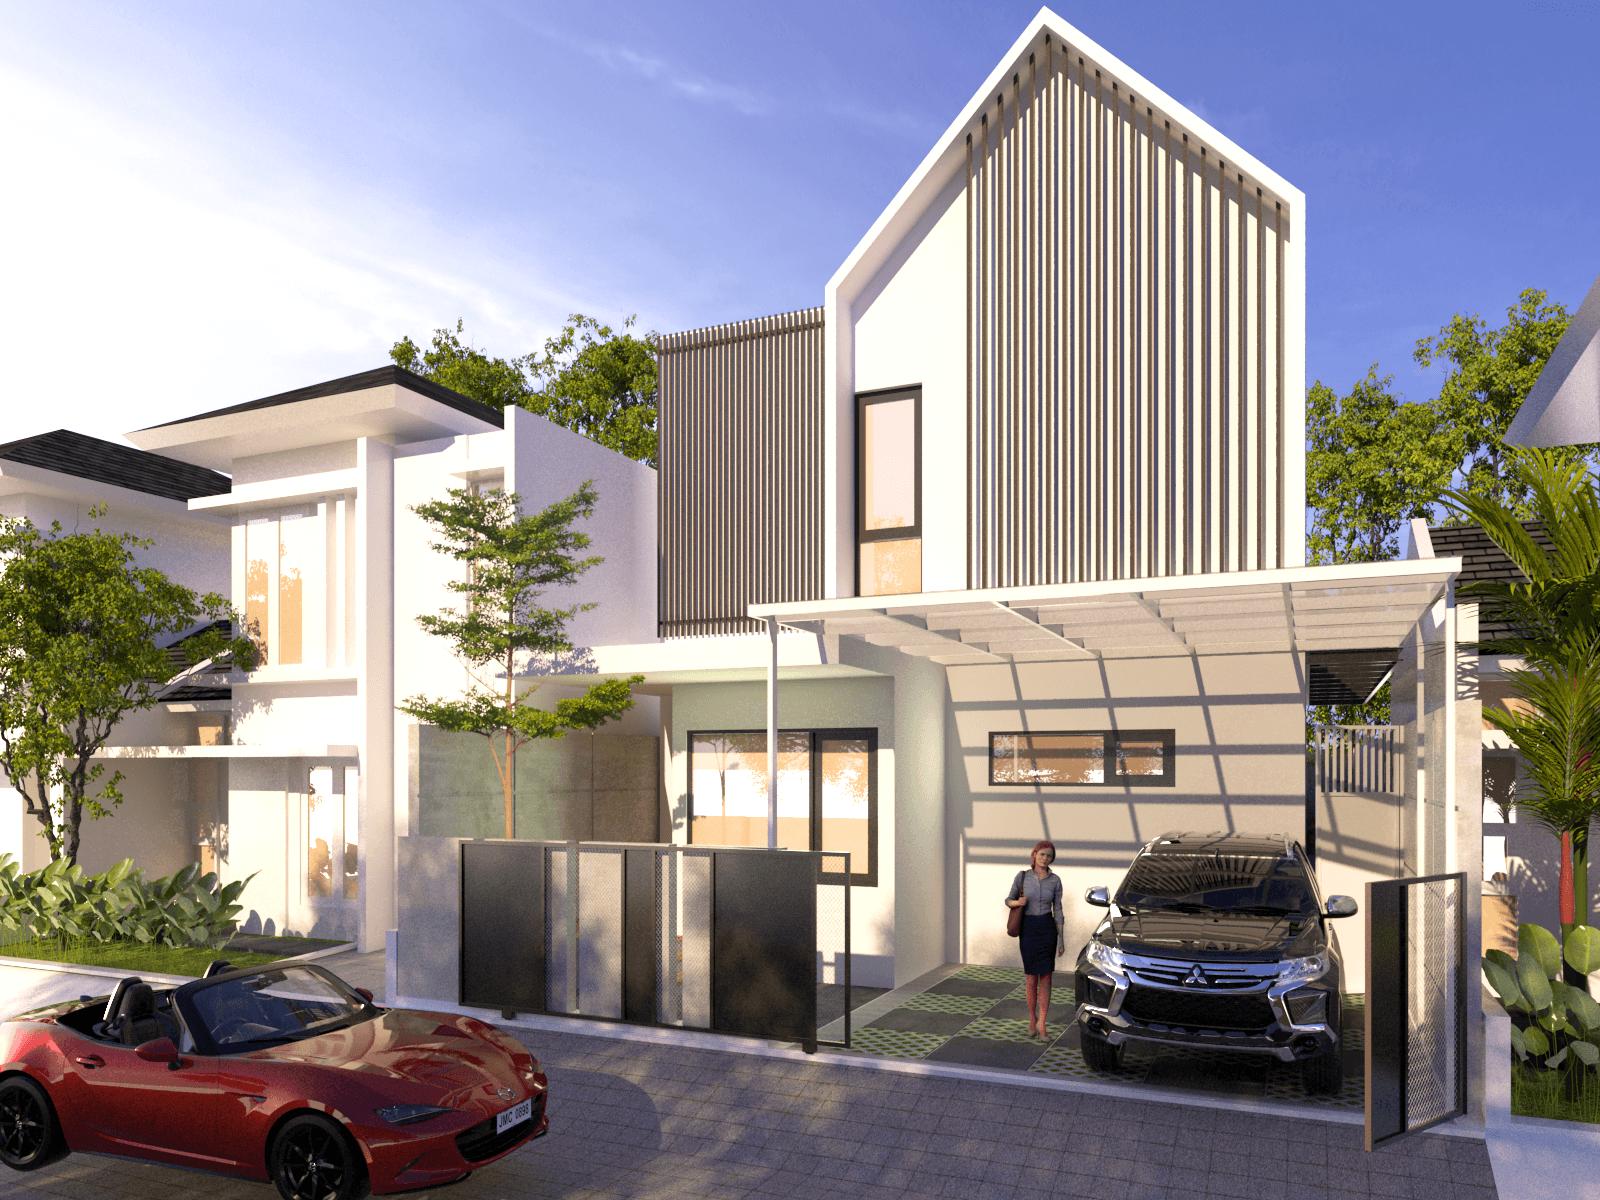 Artisia Studio House Of Mr. Jangkar Surabaya, Kota Sby, Jawa Timur, Indonesia Surabaya, Kota Sby, Jawa Timur, Indonesia Artisia-Studio-House-Of-Mr-Jangkar  81772